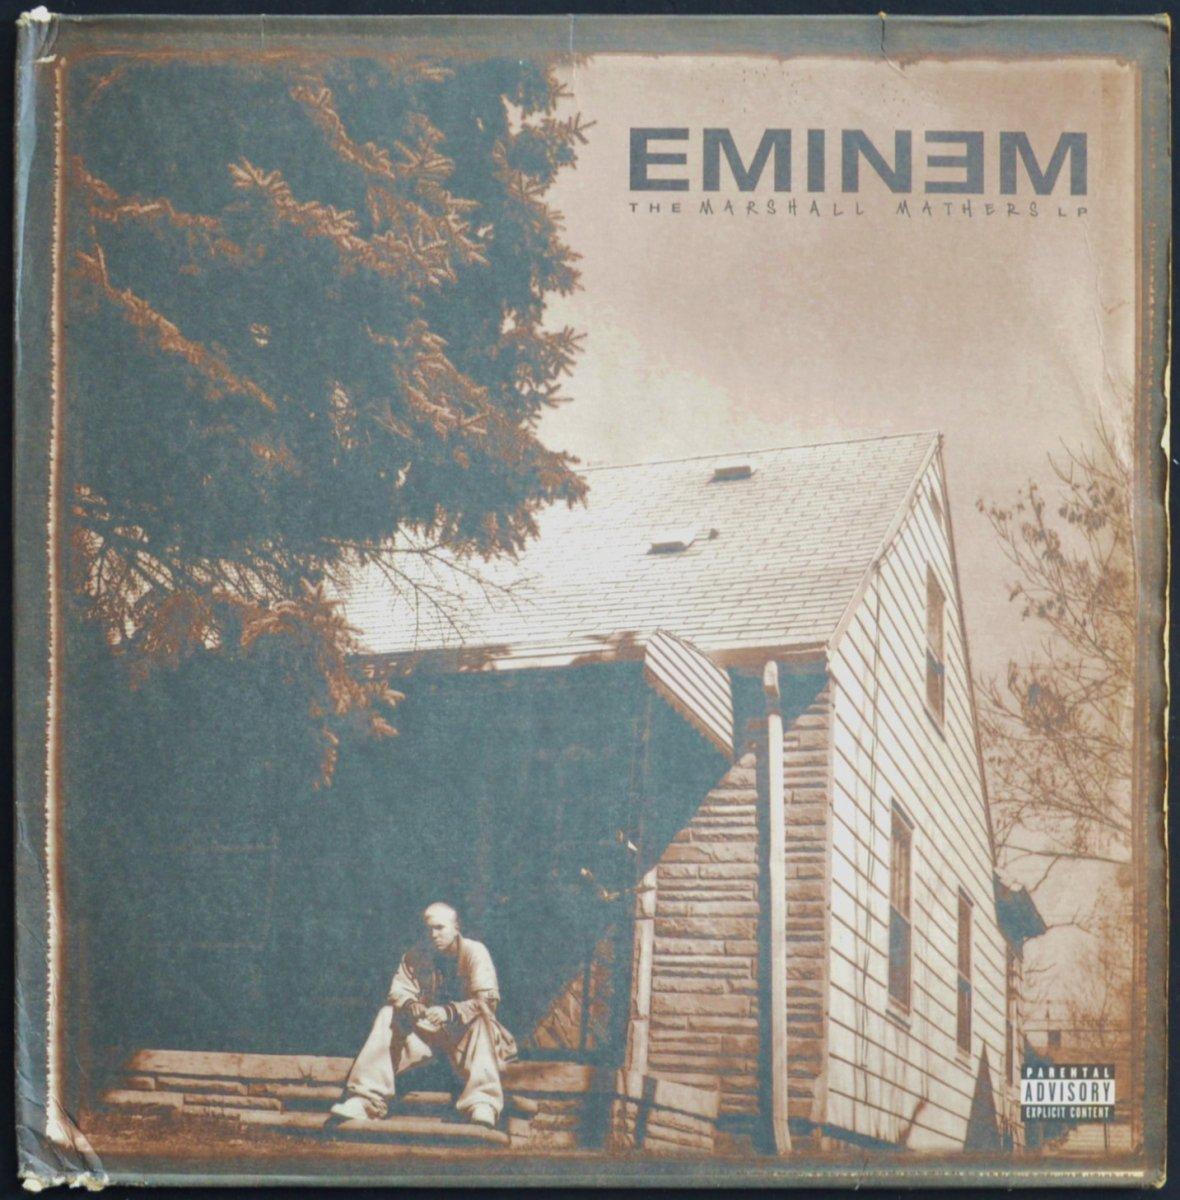 EMINEM / THE MARSHALL MATHERS LP (2LP)